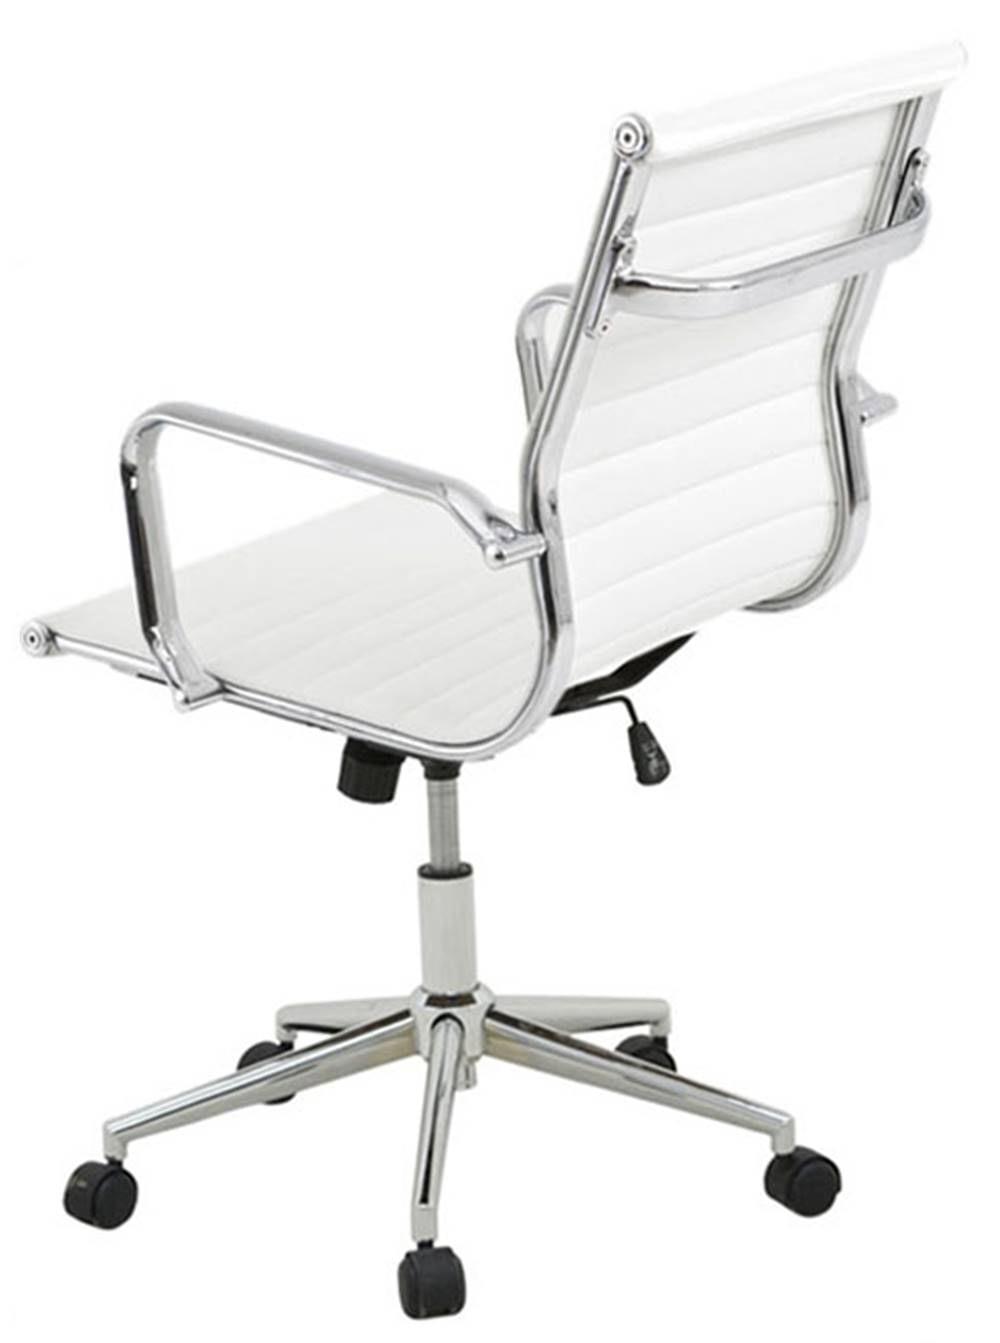 Cadeira Sevilha Eames Baixa Cromada PU Branco - 8748